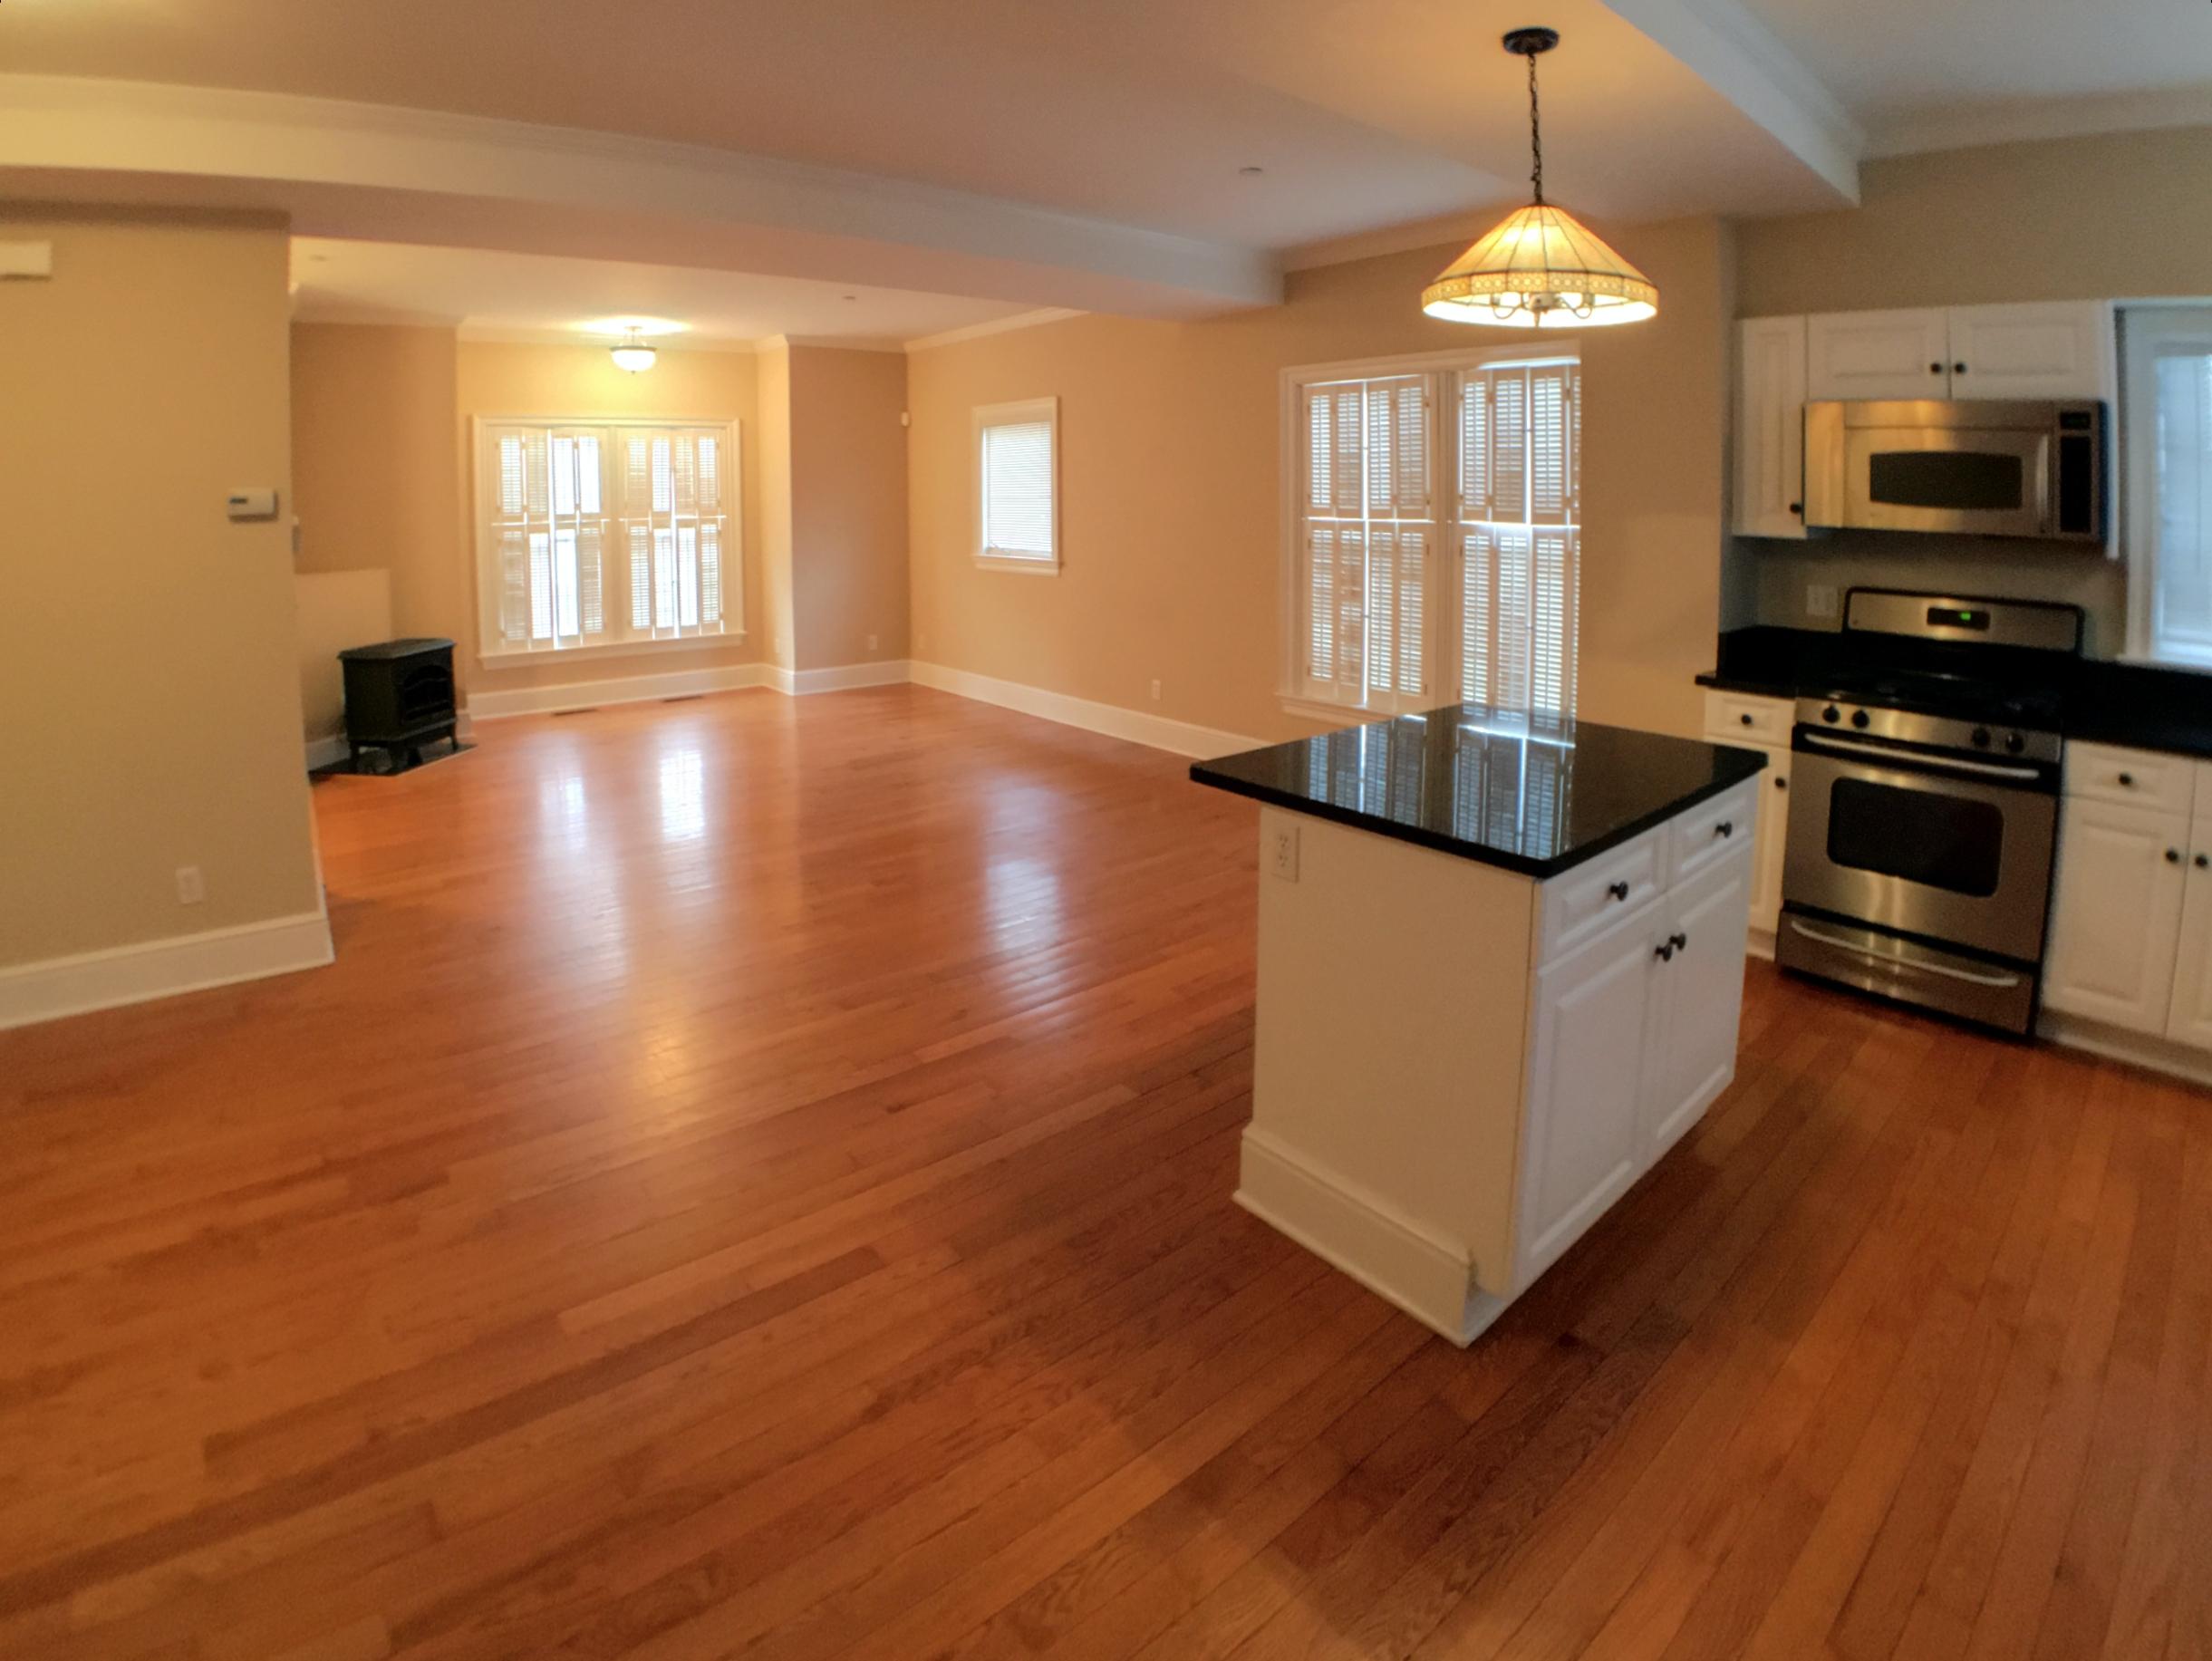 Norwalk 3 Bedroom Rental At 8 16 Haviland St Norwalk Ct 06854 B1 3200 Apartable